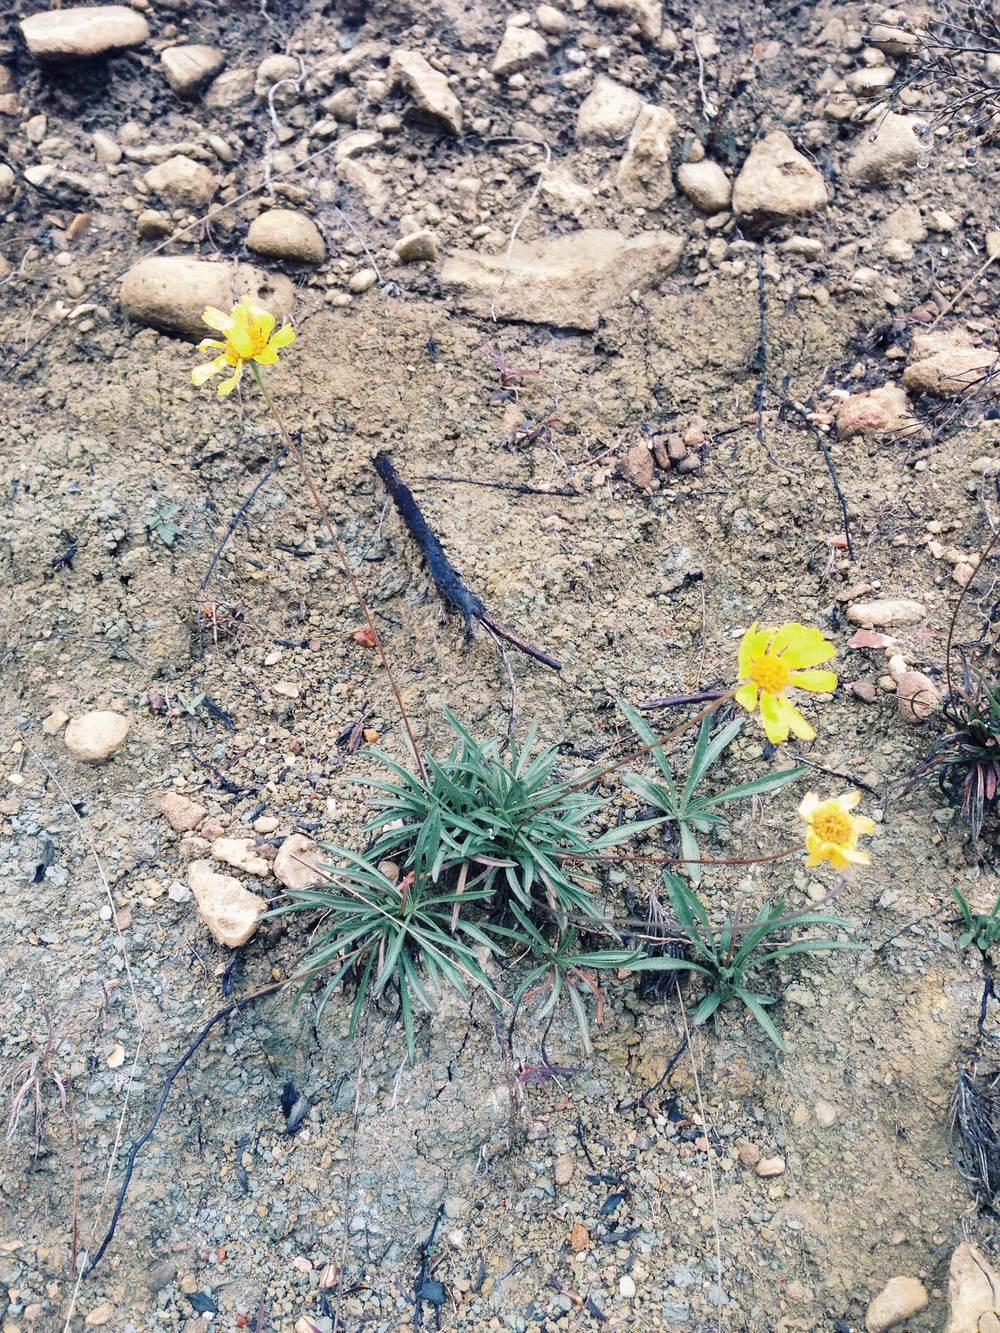 Plant: Tetraneuris scaposa, Four Nerve Daisy | Location: Double Eagle Ranch, Burnet Co., Texas